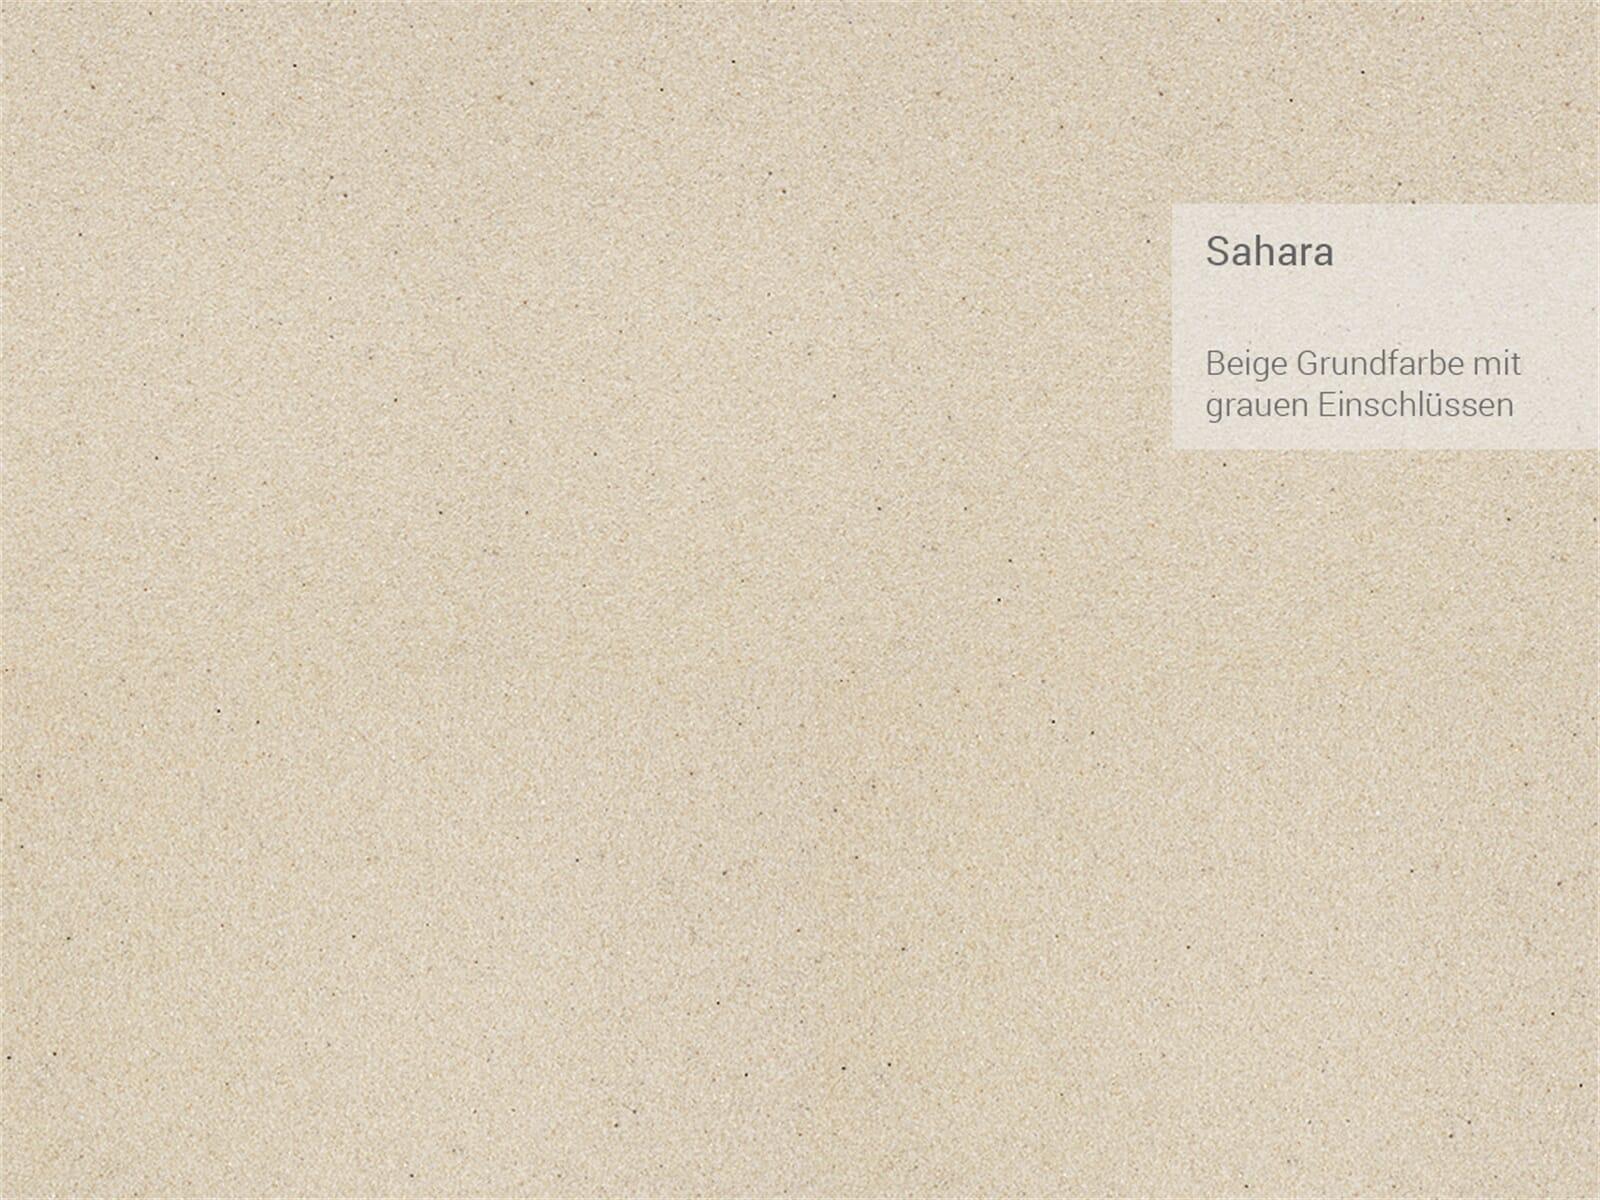 Franke Strata STG 614-78 Sahara Granitspüle Exzenterventil